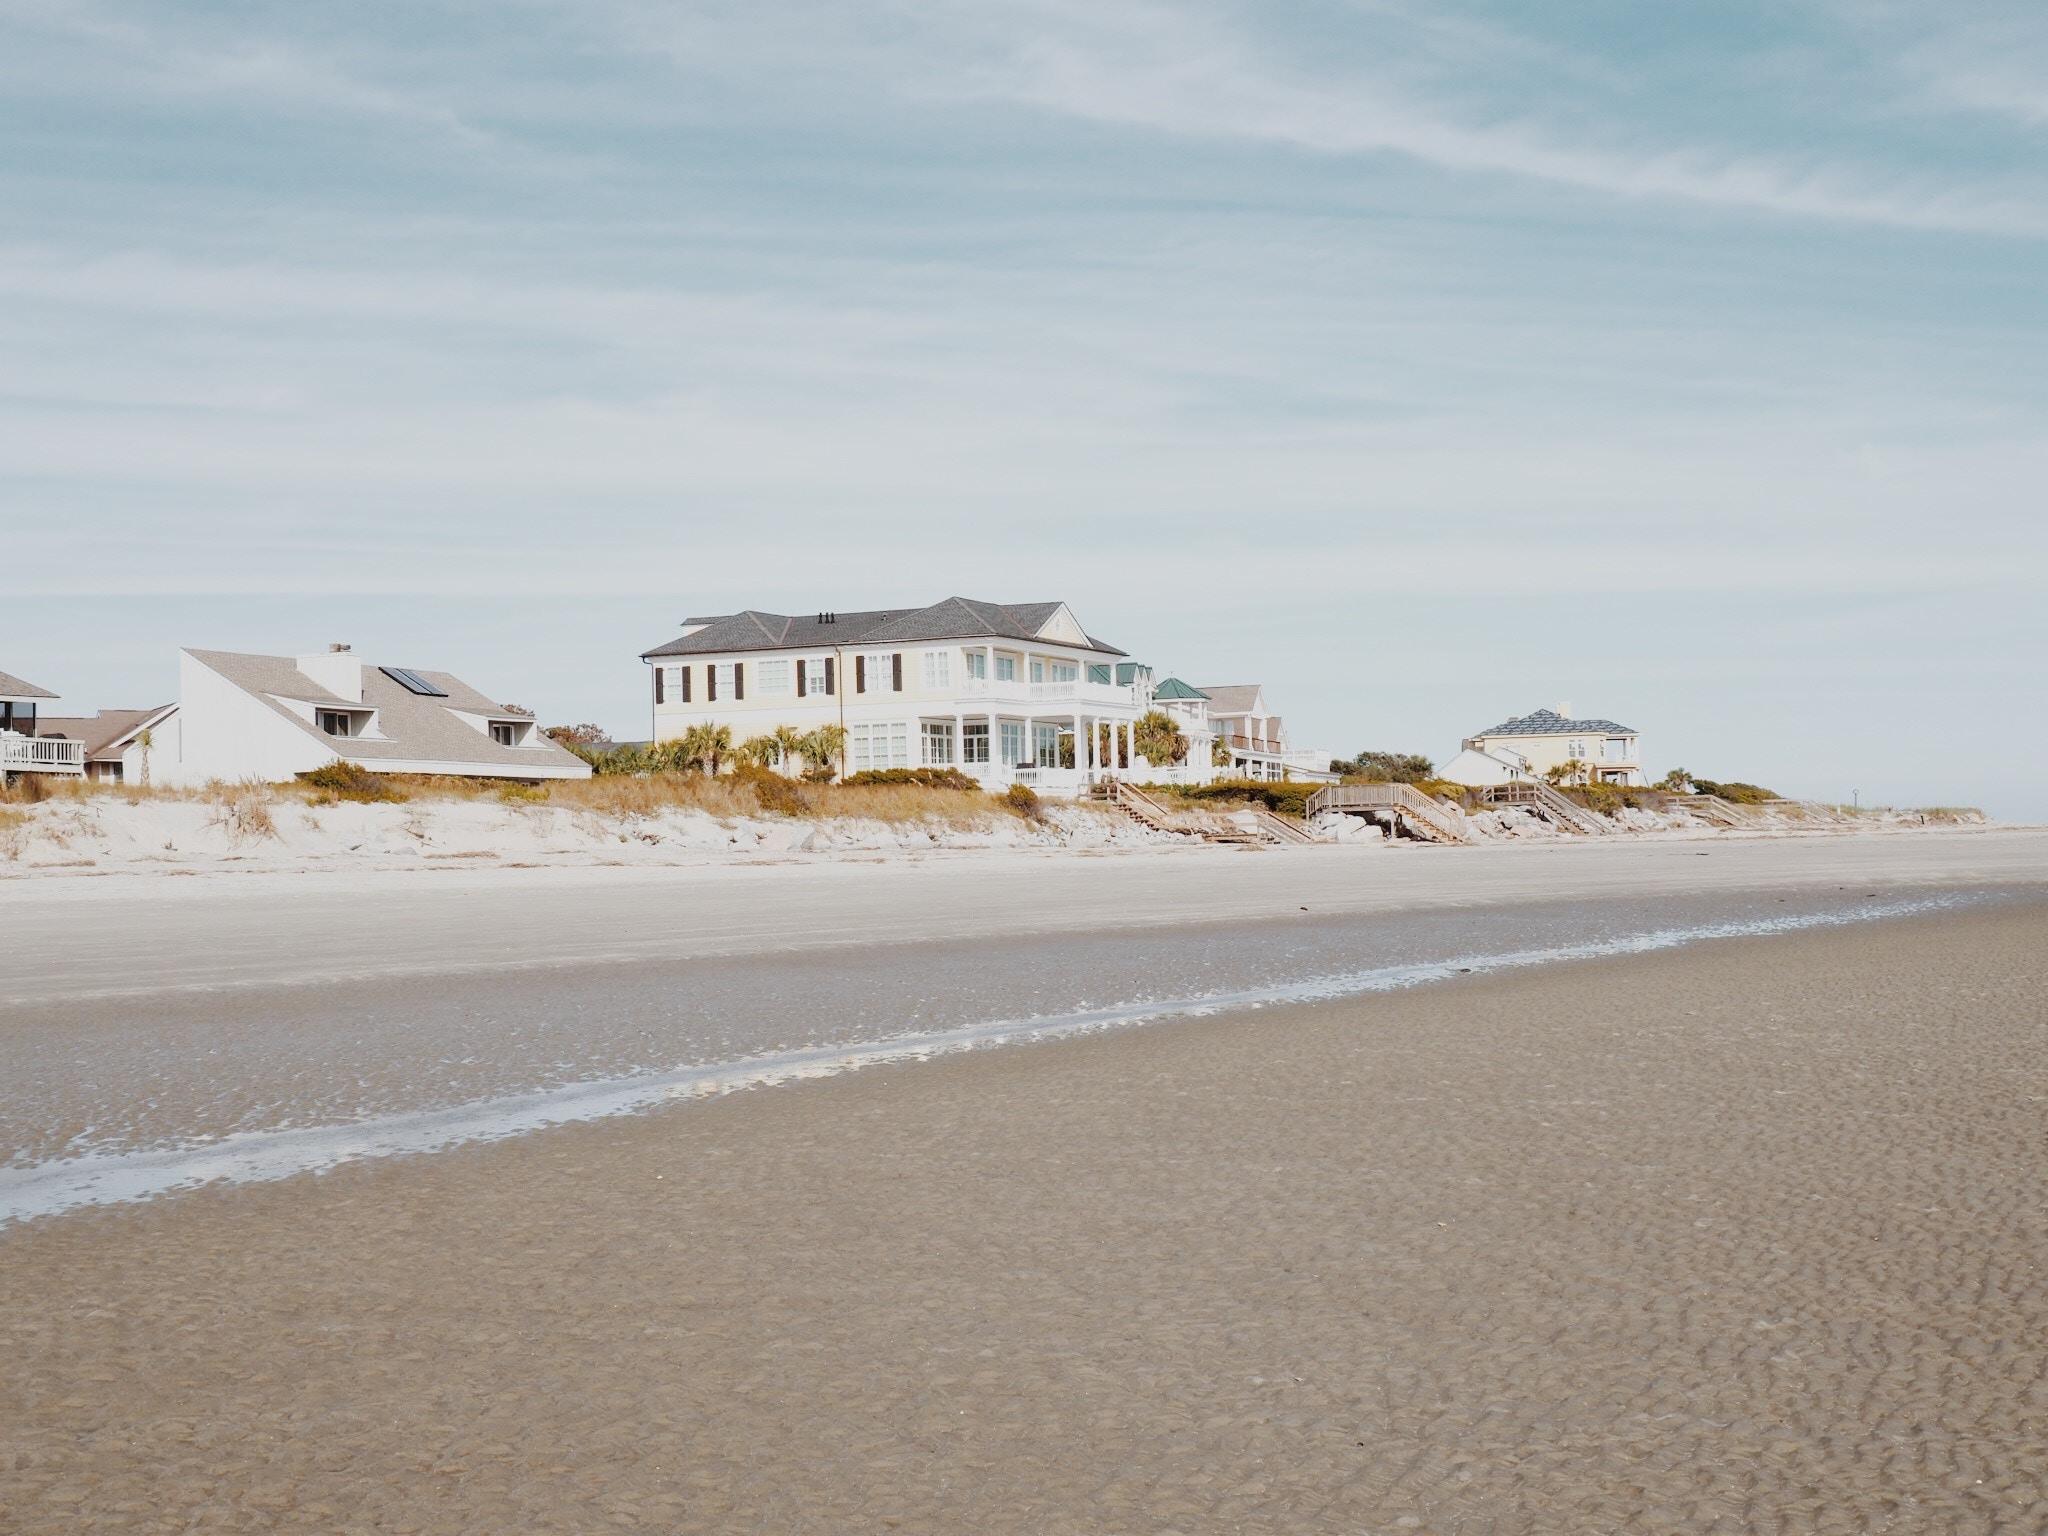 Seabrook Island bij Charleston, SC